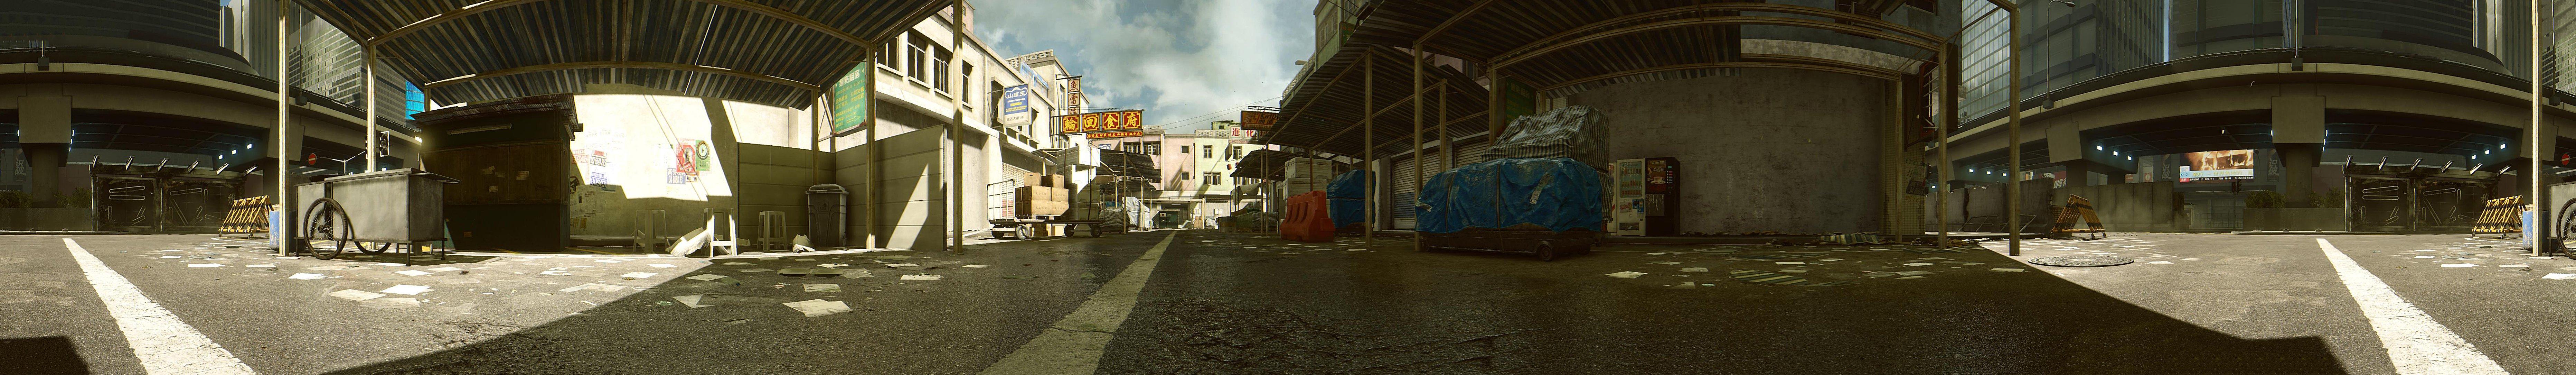 Battlefield 4 Dragon's Teeth в широком формате (панорама) - Изображение 2